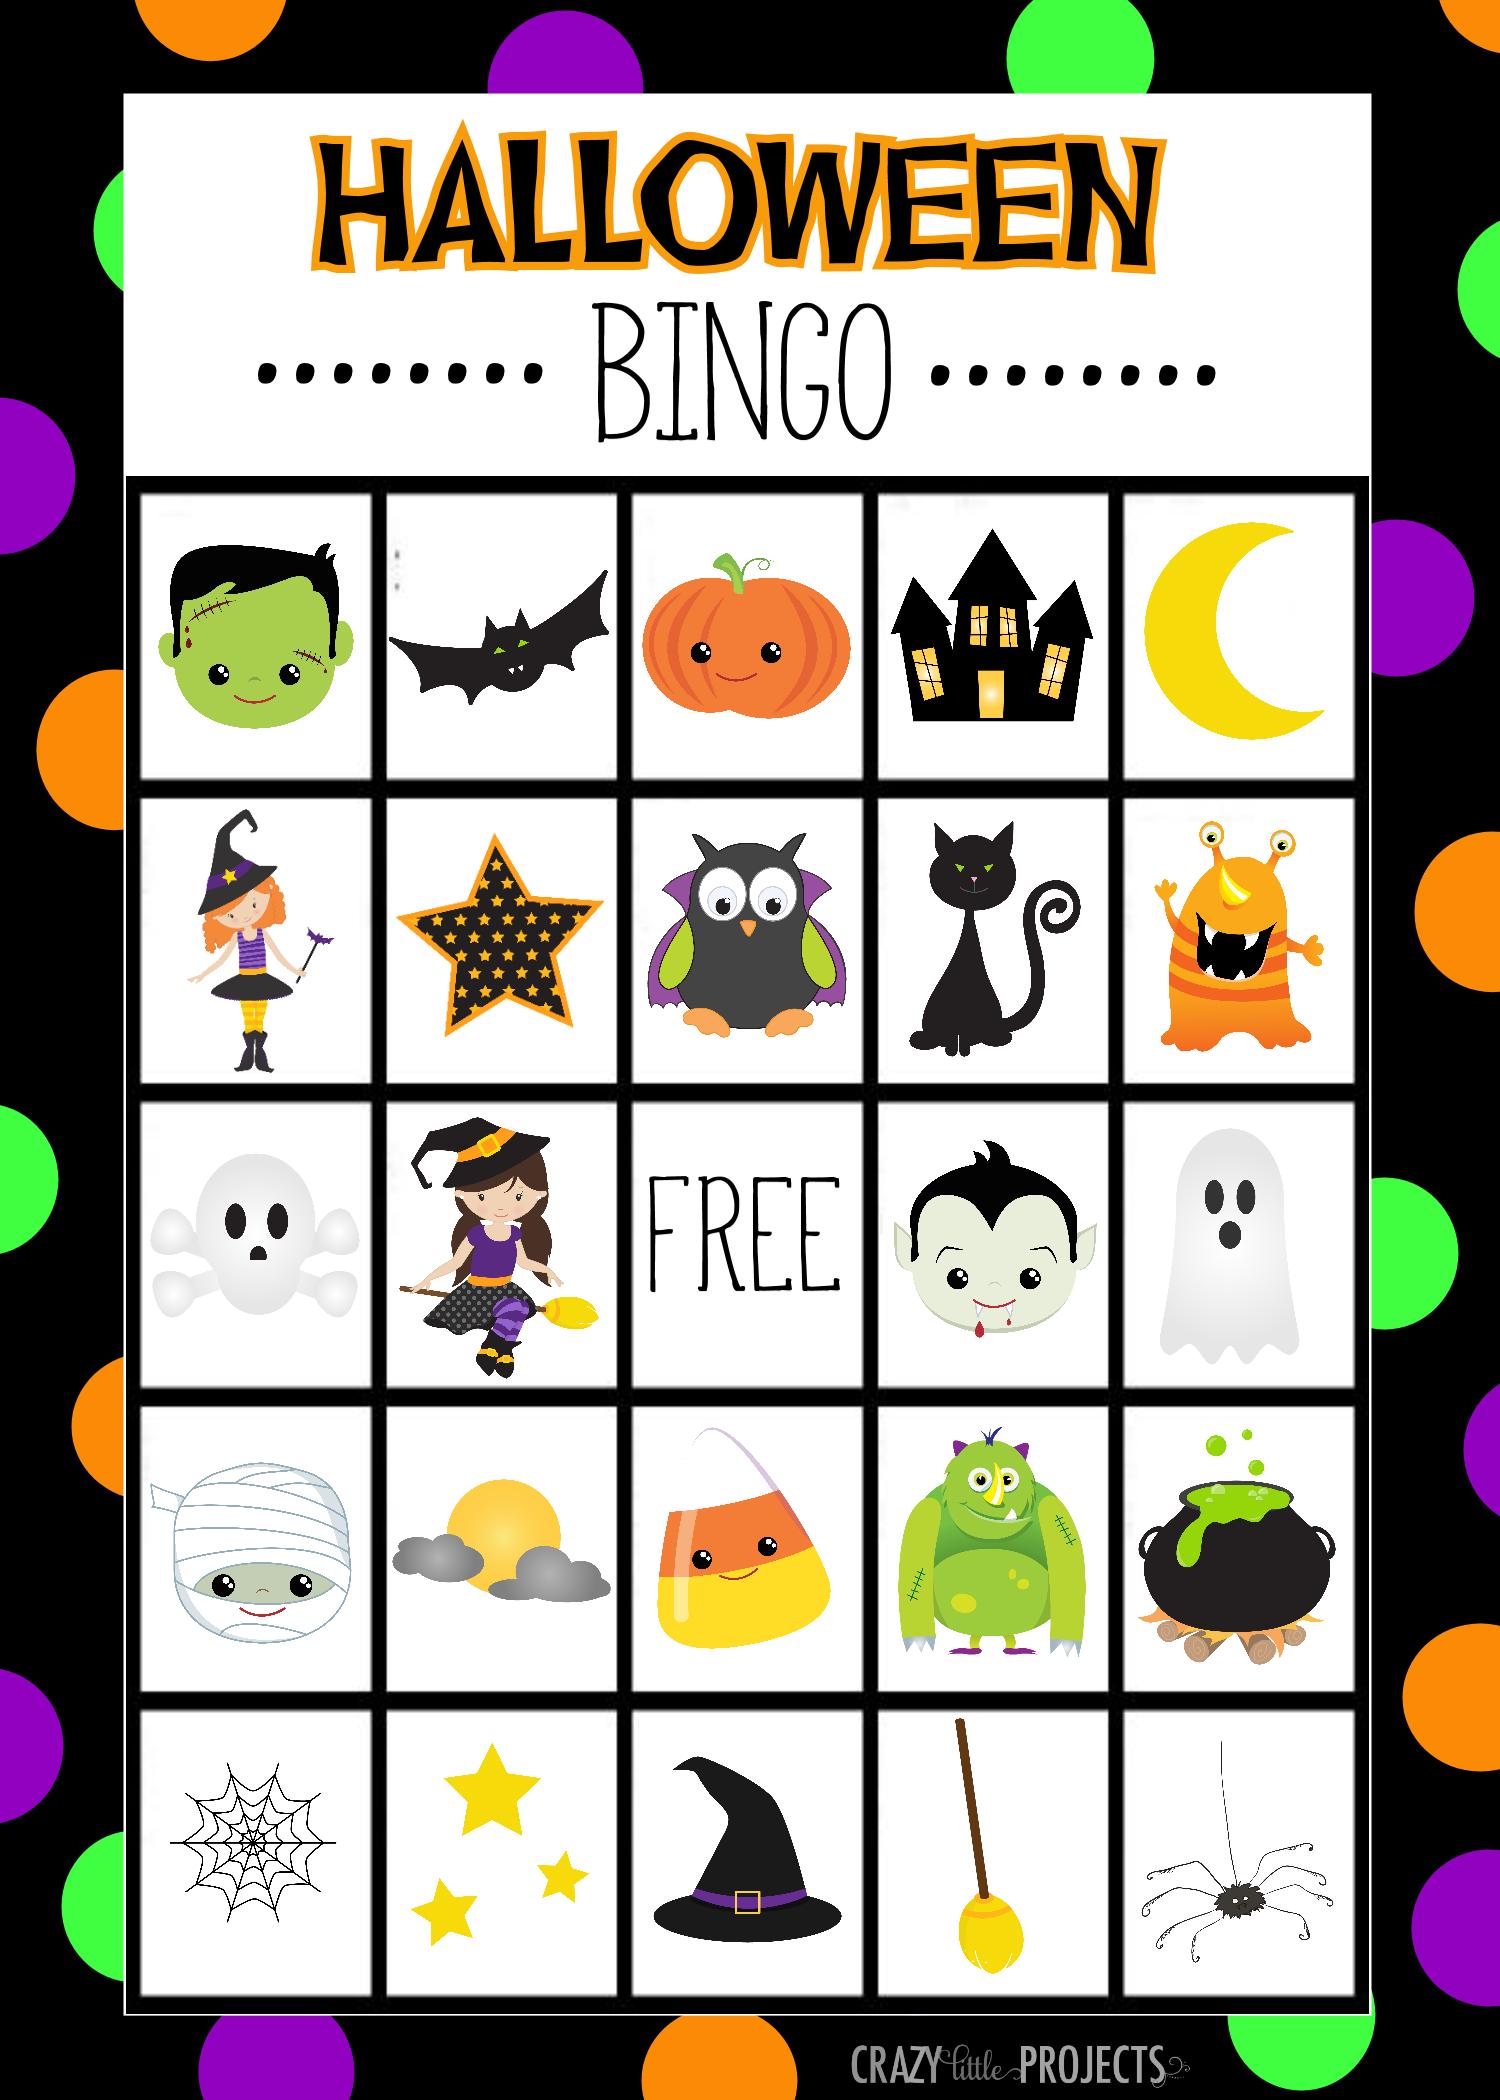 Free Printable Halloween Bingo Cardscrazy Little Projects - Free Printable Halloween Bingo Cards